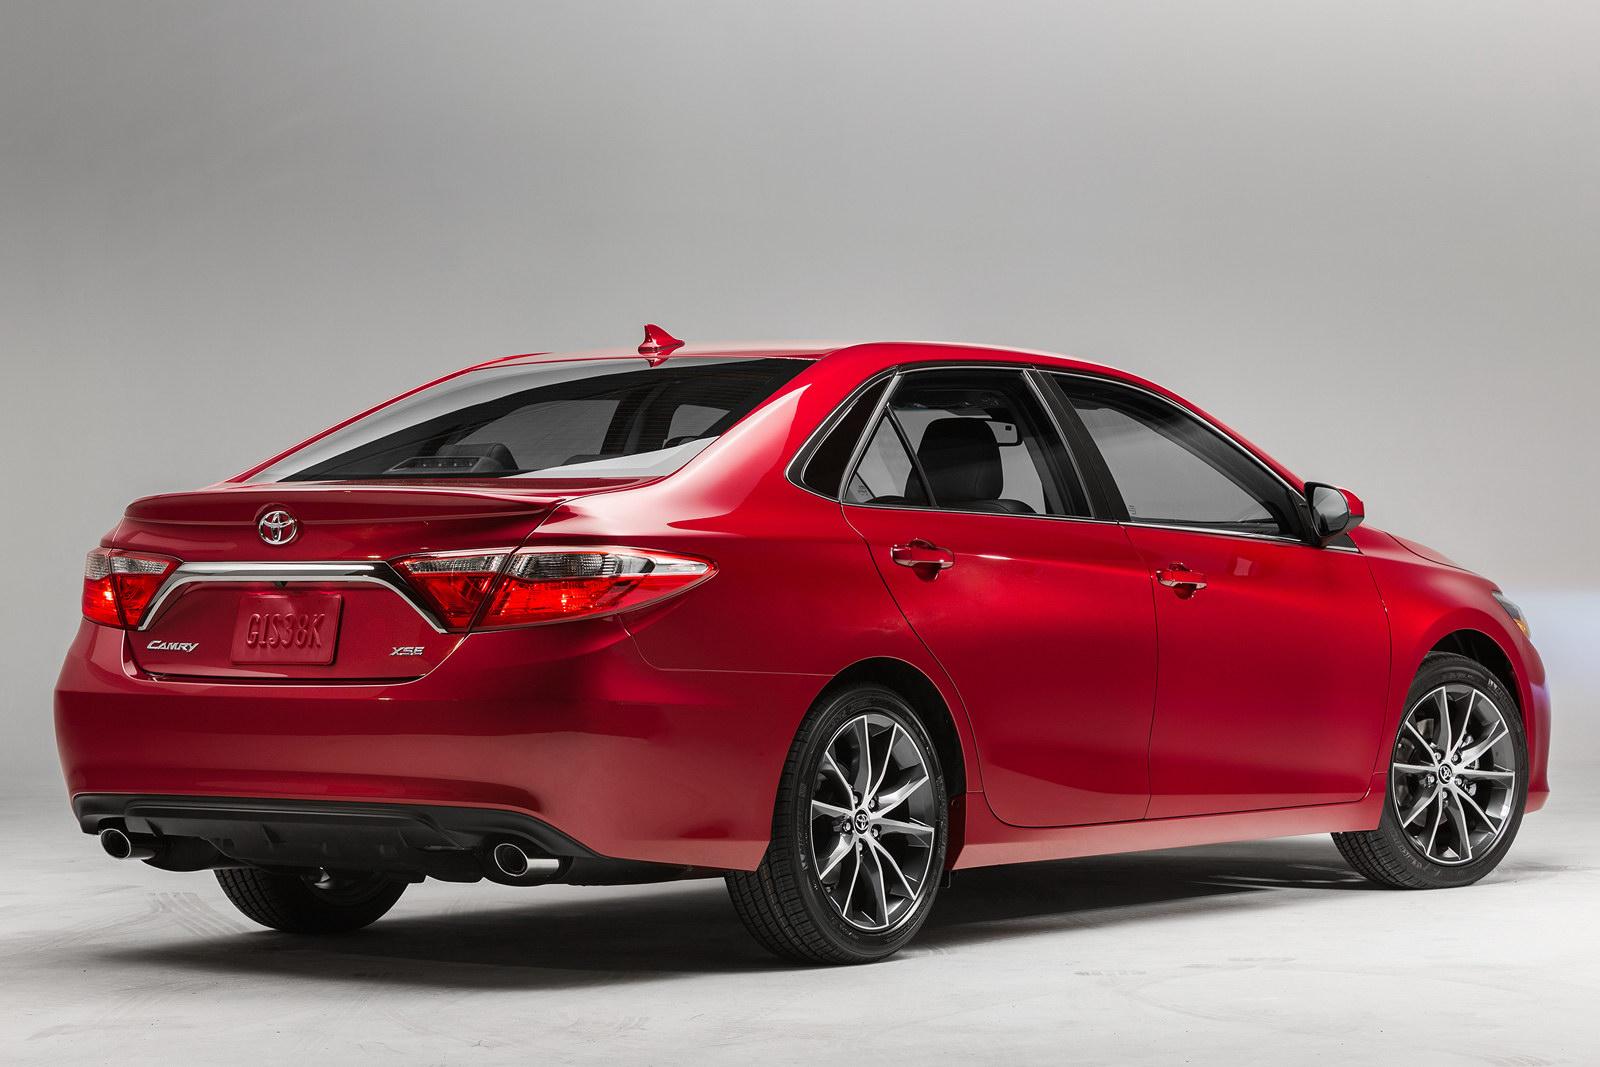 Toyota Camry 2015 Mundoautomotor